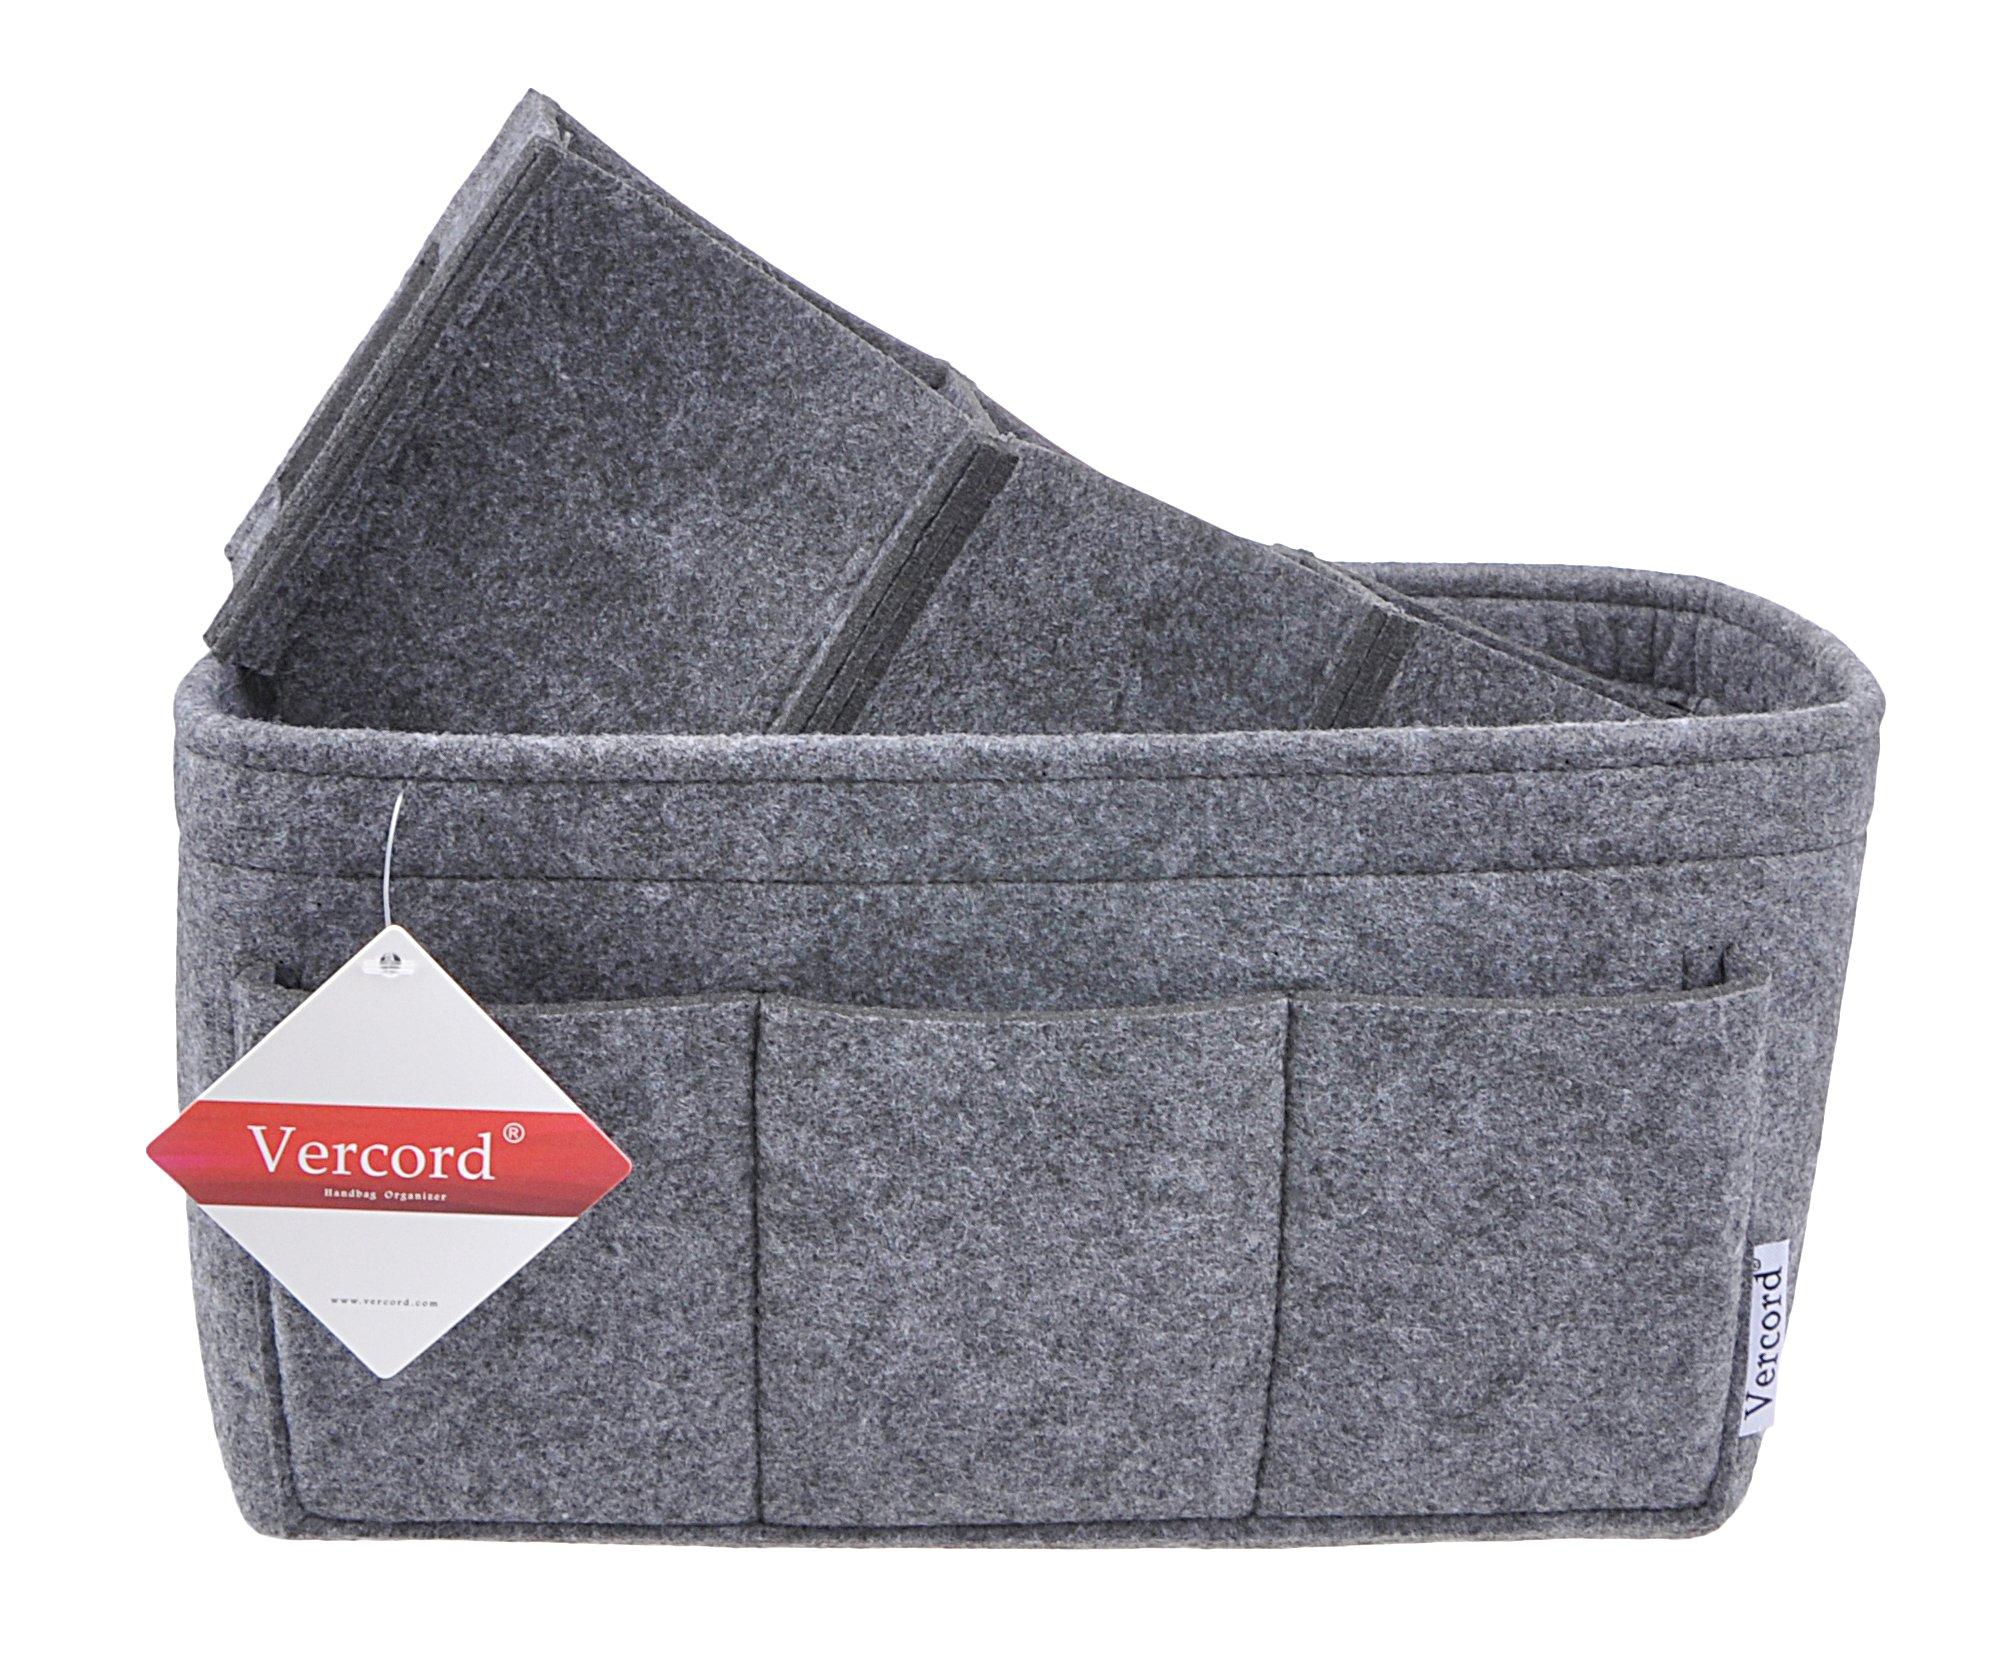 Women's Purse Organzier Sturdy Felt Handbag Liner Insert Bag Grey M